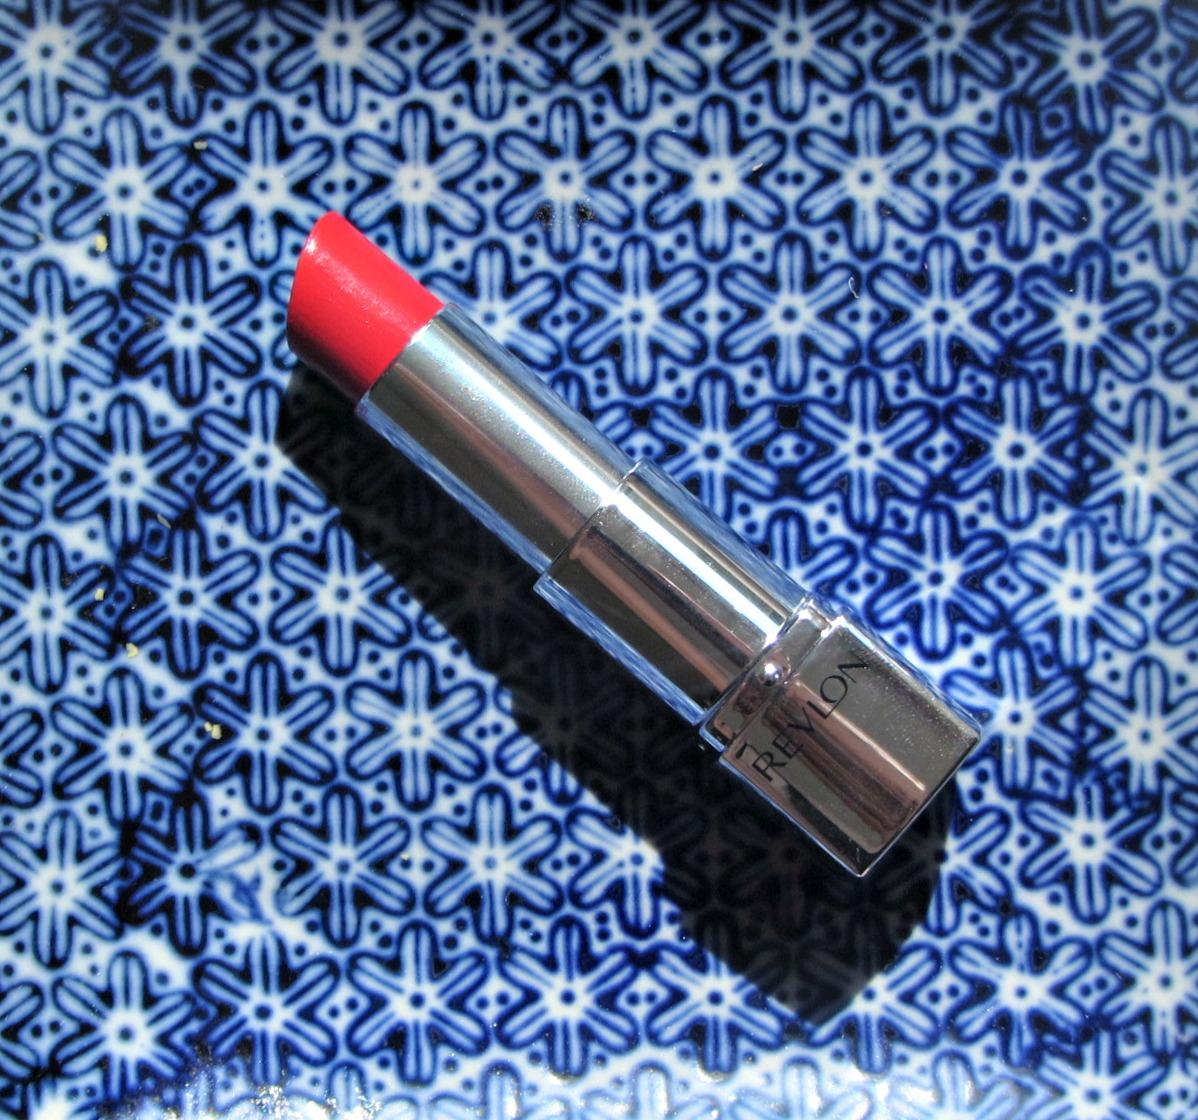 Lipstick Like: Revlon Ultra HD lipstick in Poinsettia